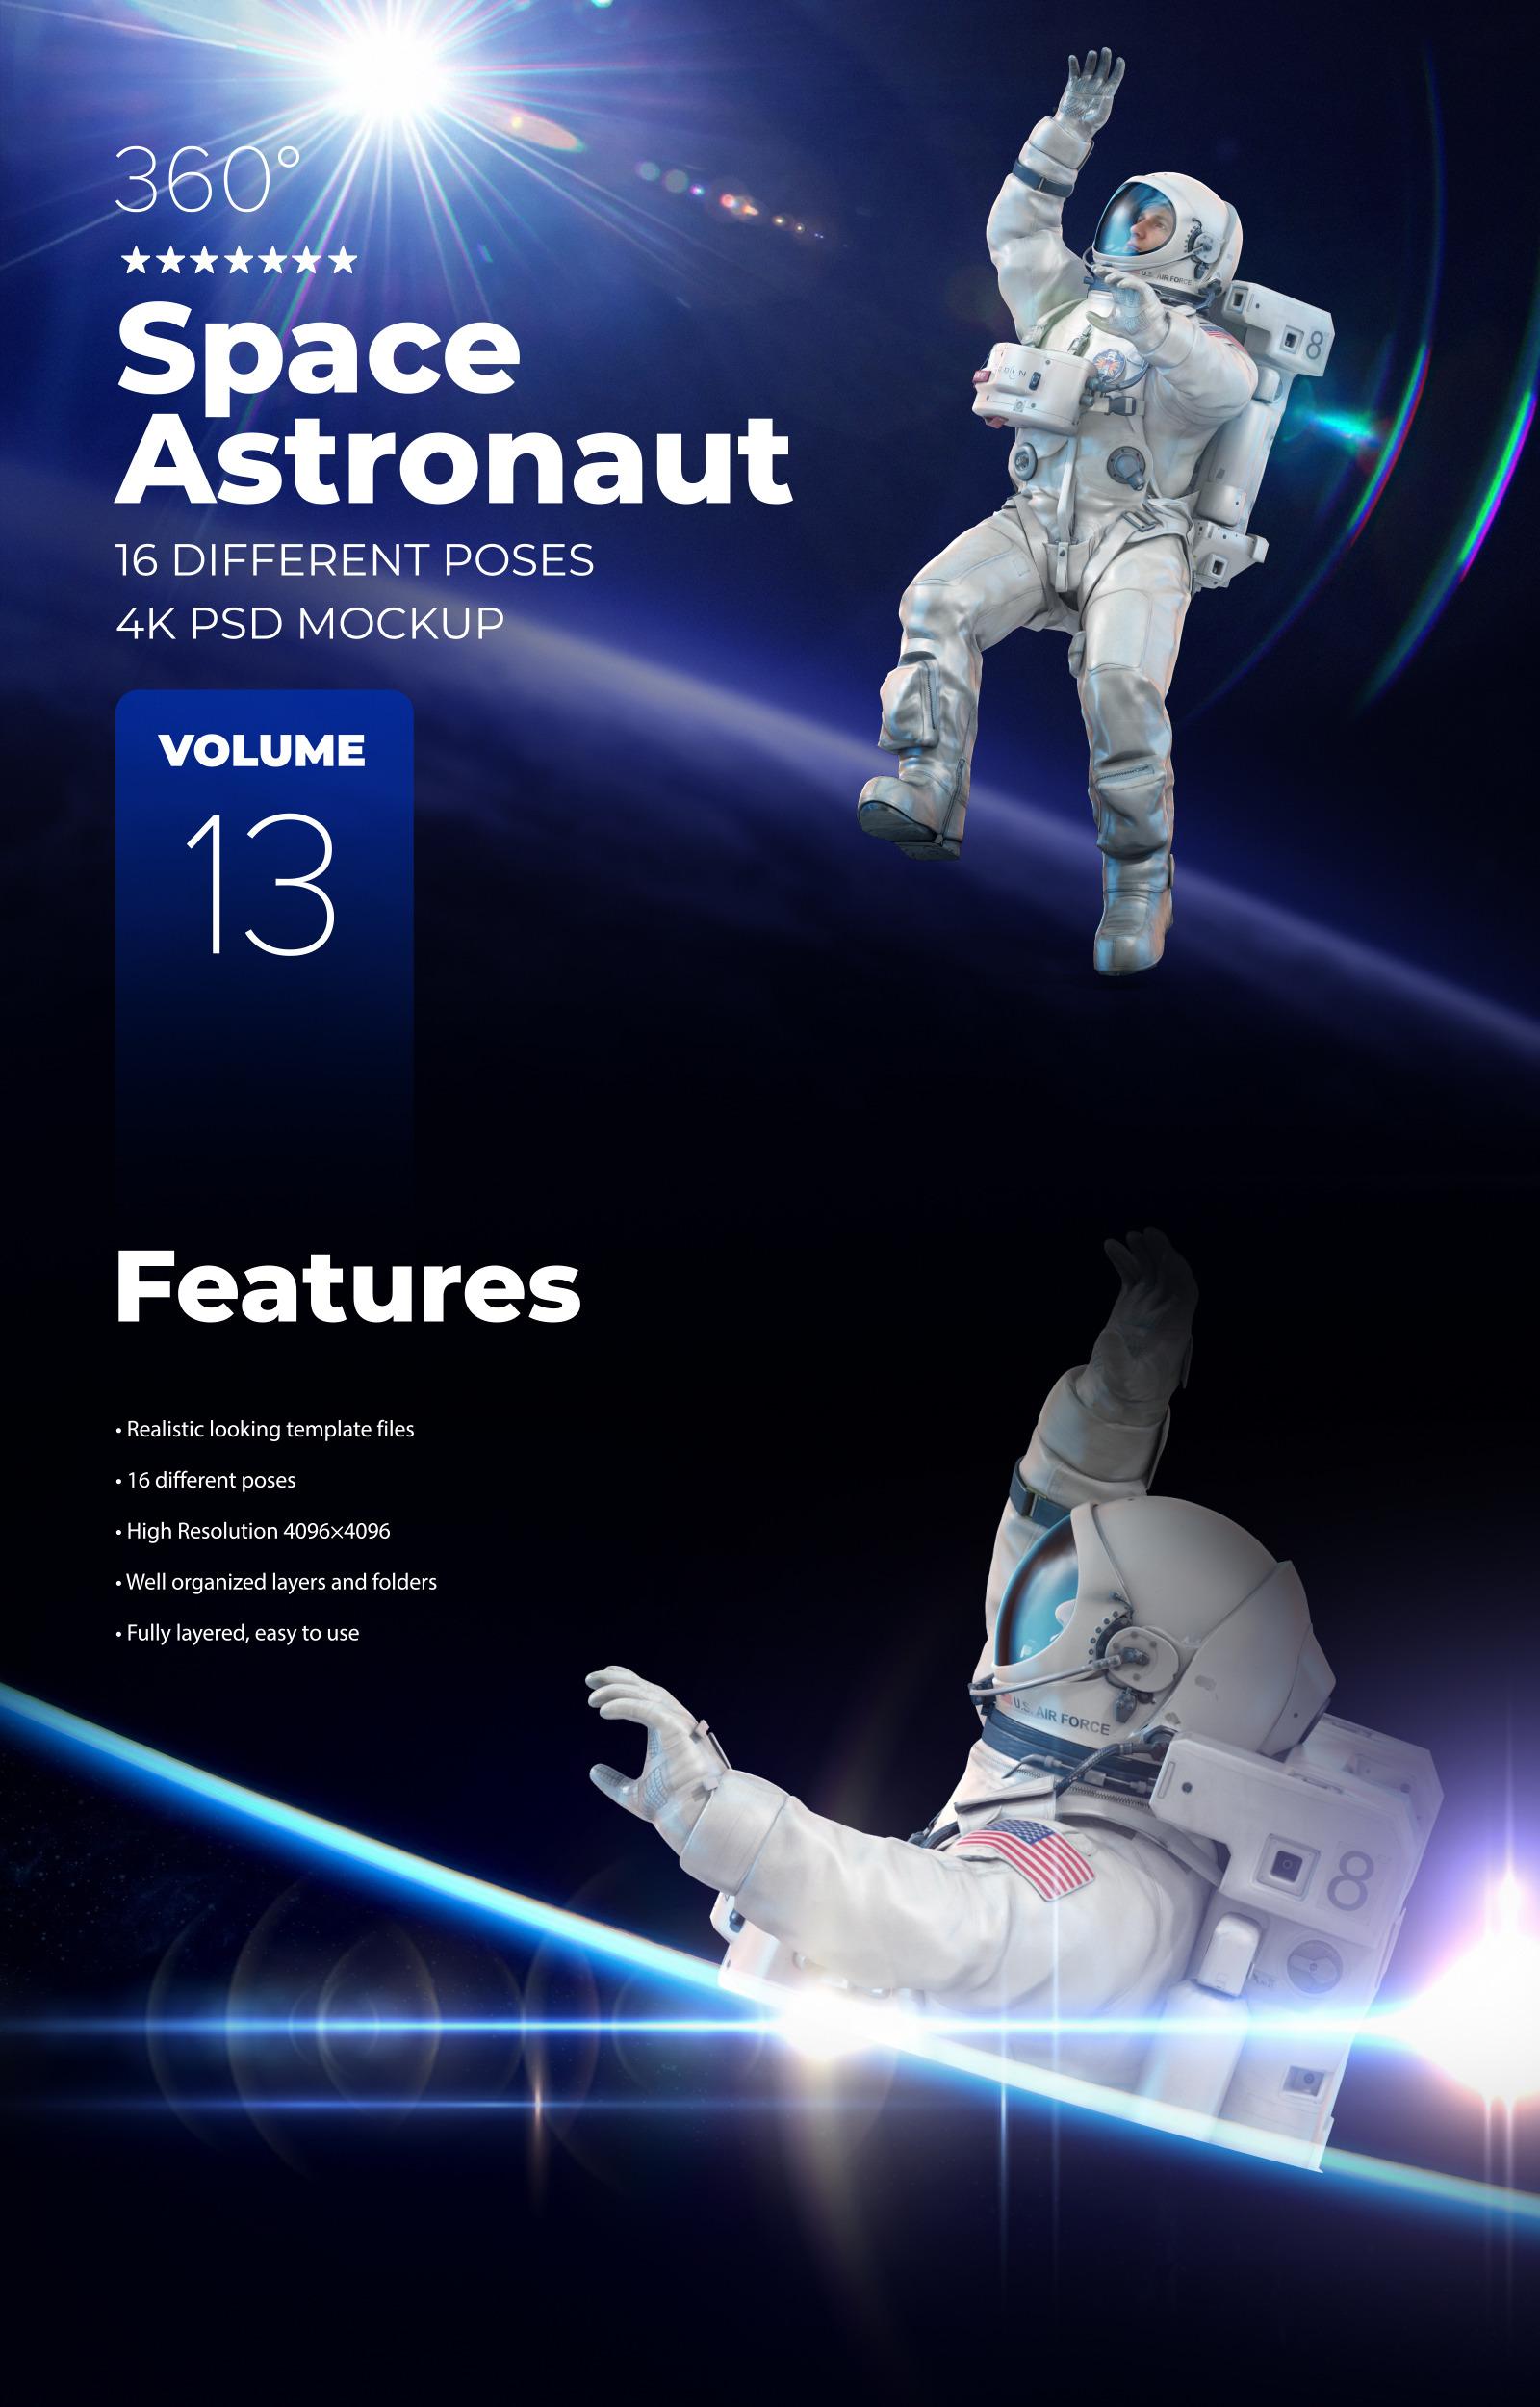 3D Mockup Space Astronaut #13